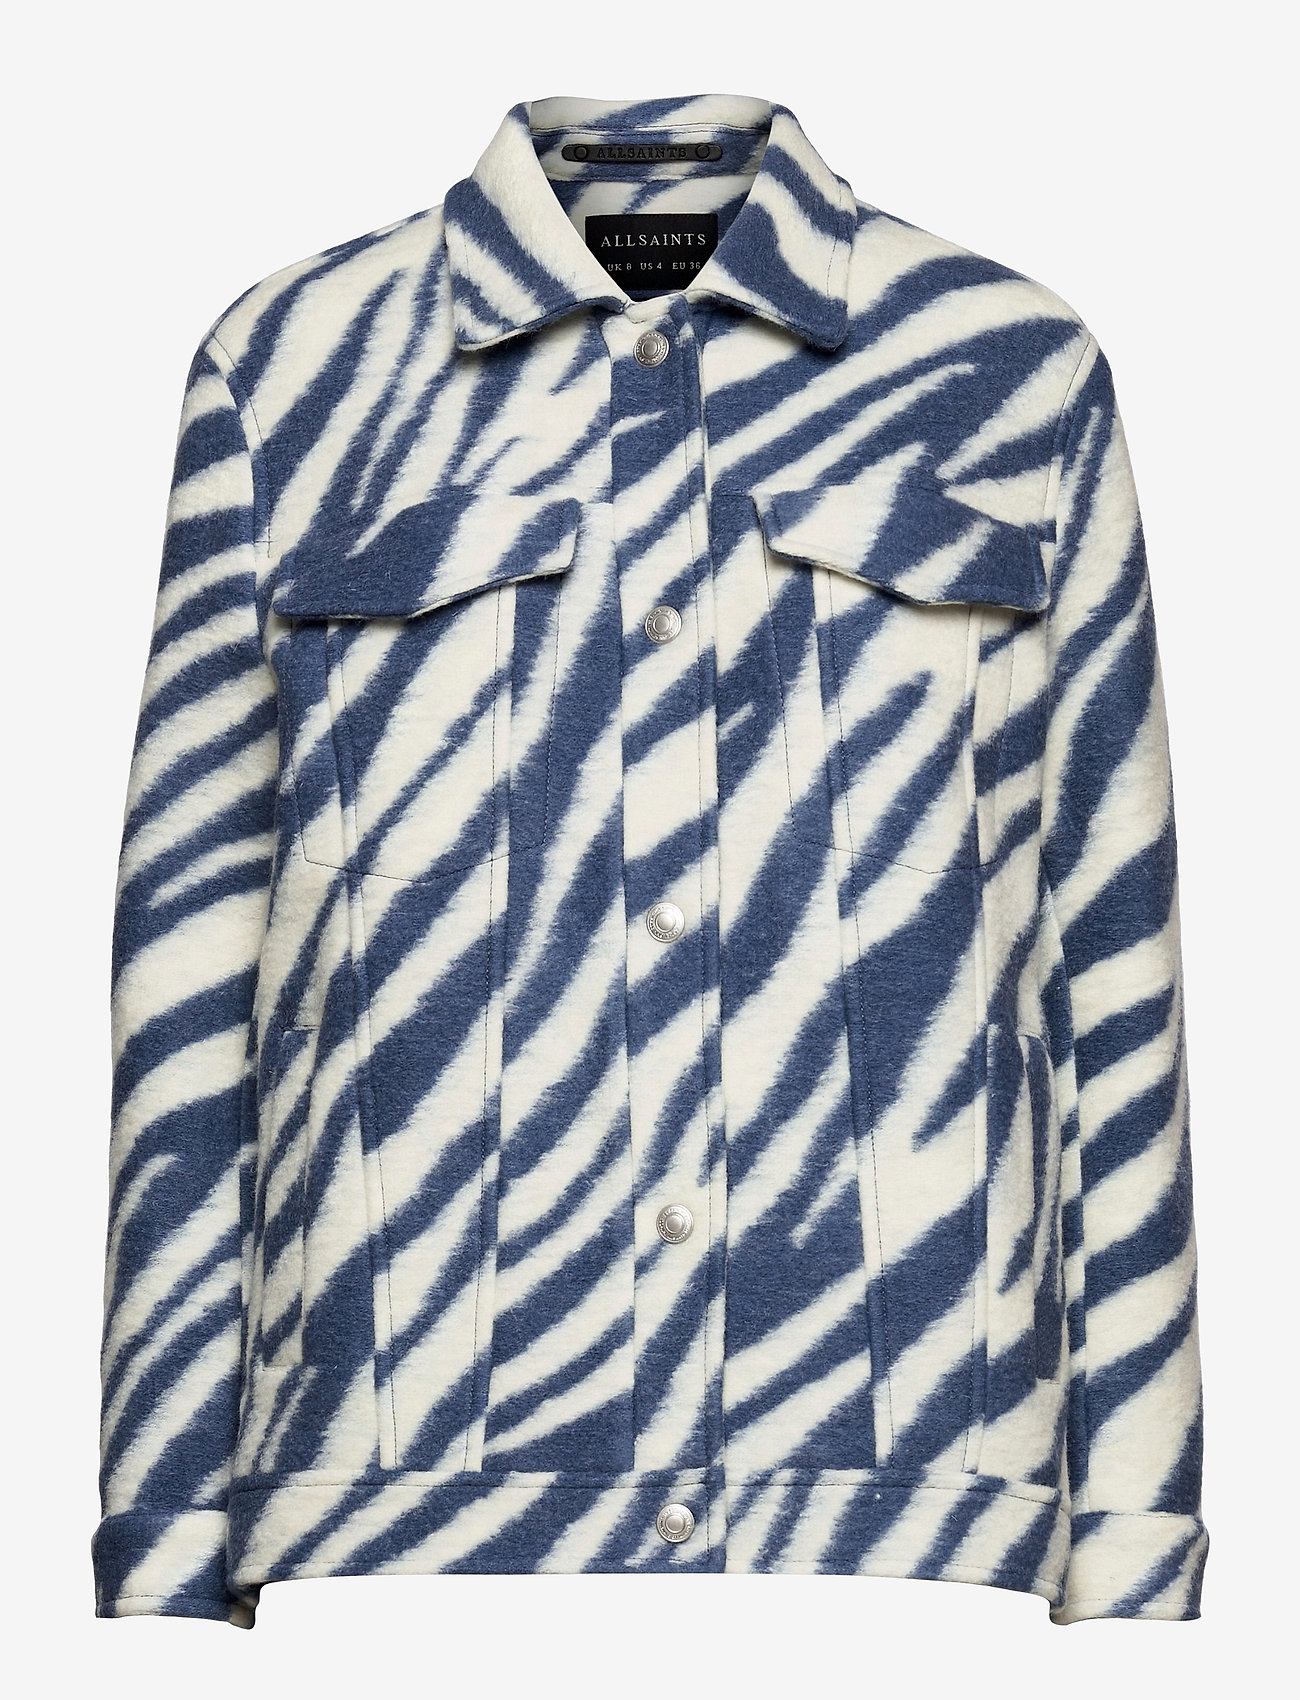 AllSaints - FAYE JACKET - wolljacken - blue/white - 0